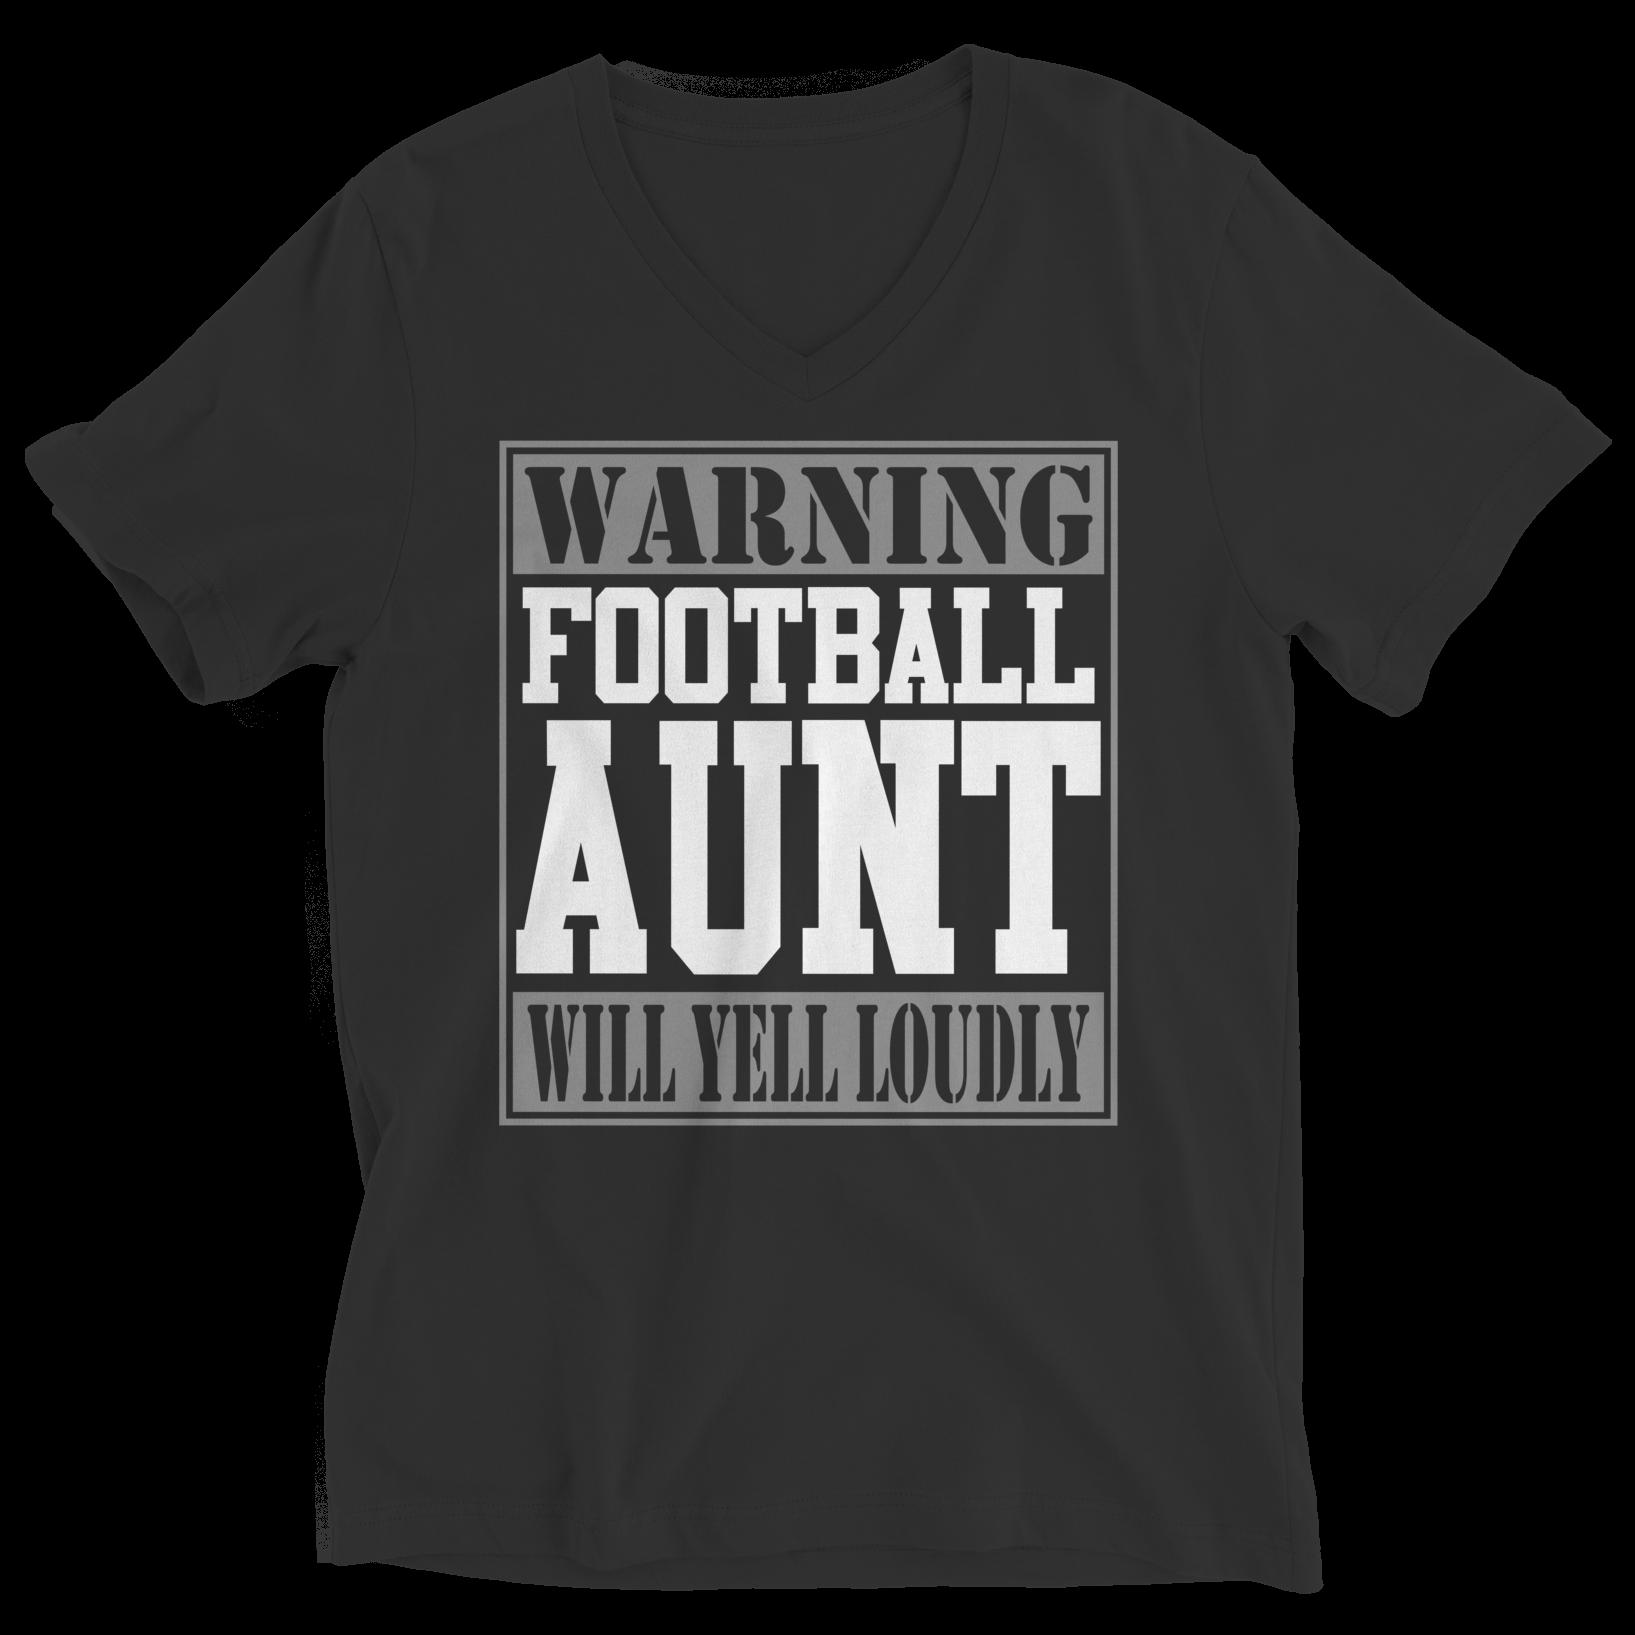 Football Aunt Shirts